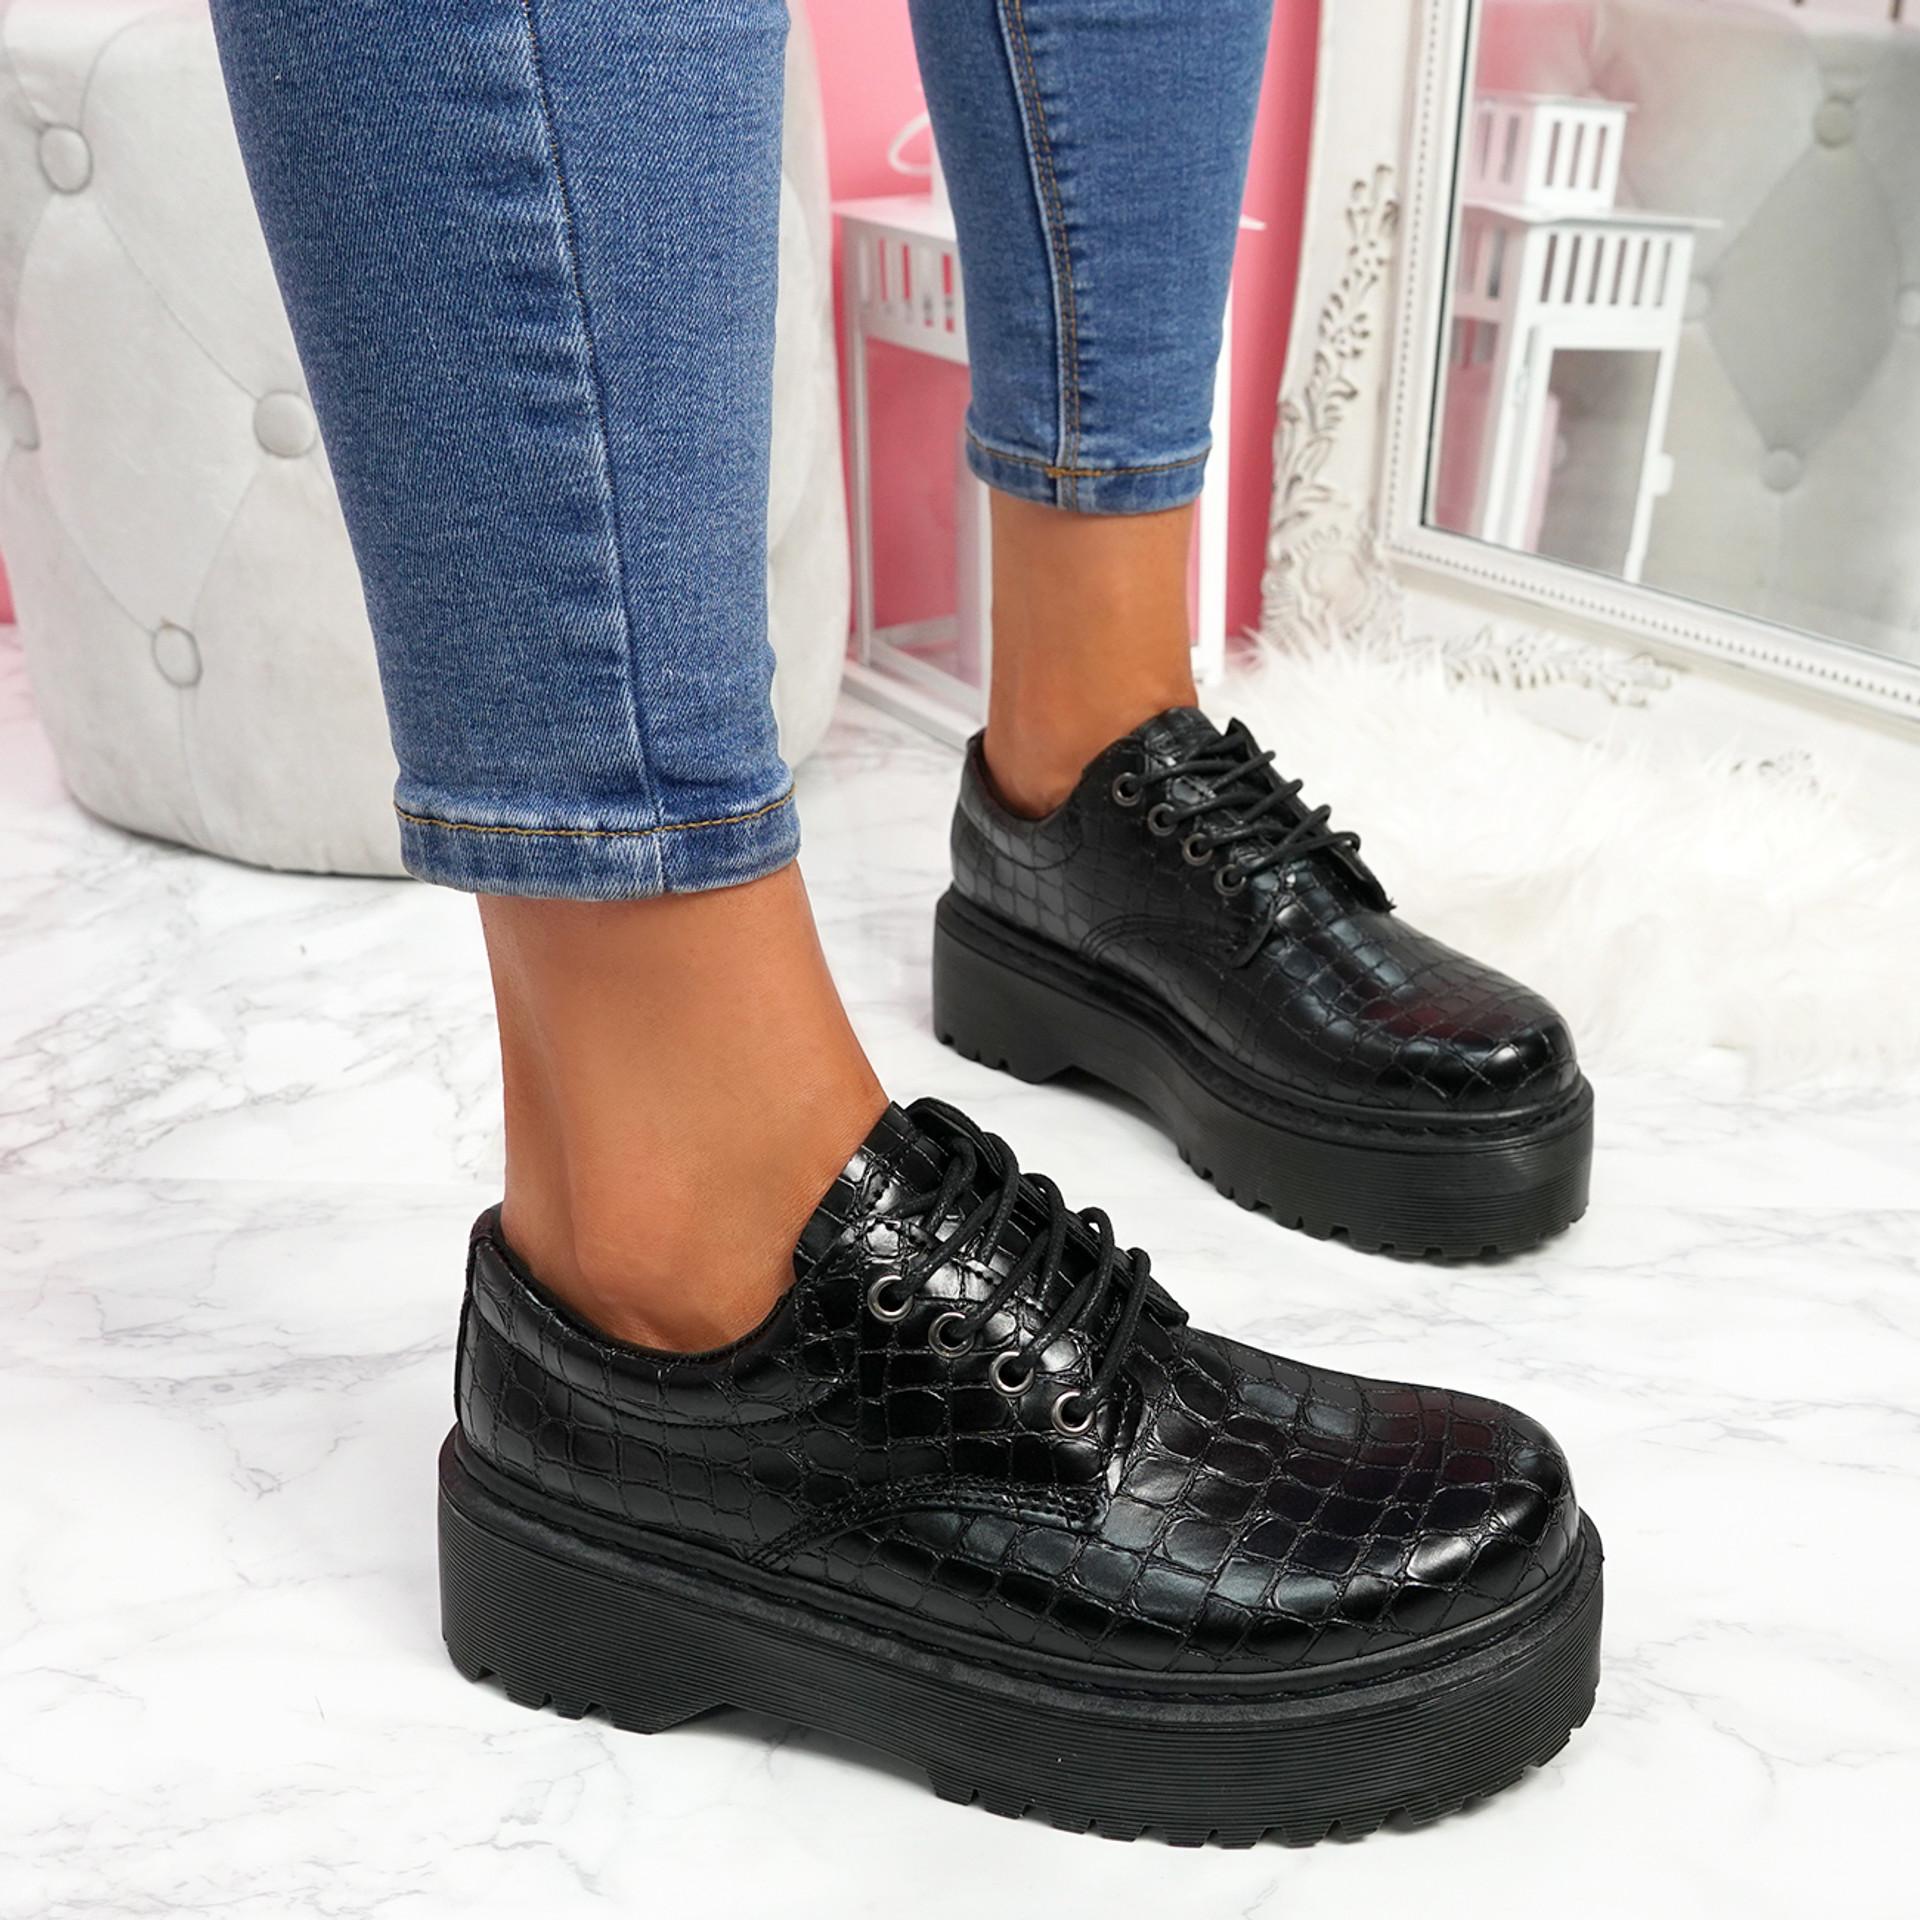 Rosy Black Croc Flatform Pumps